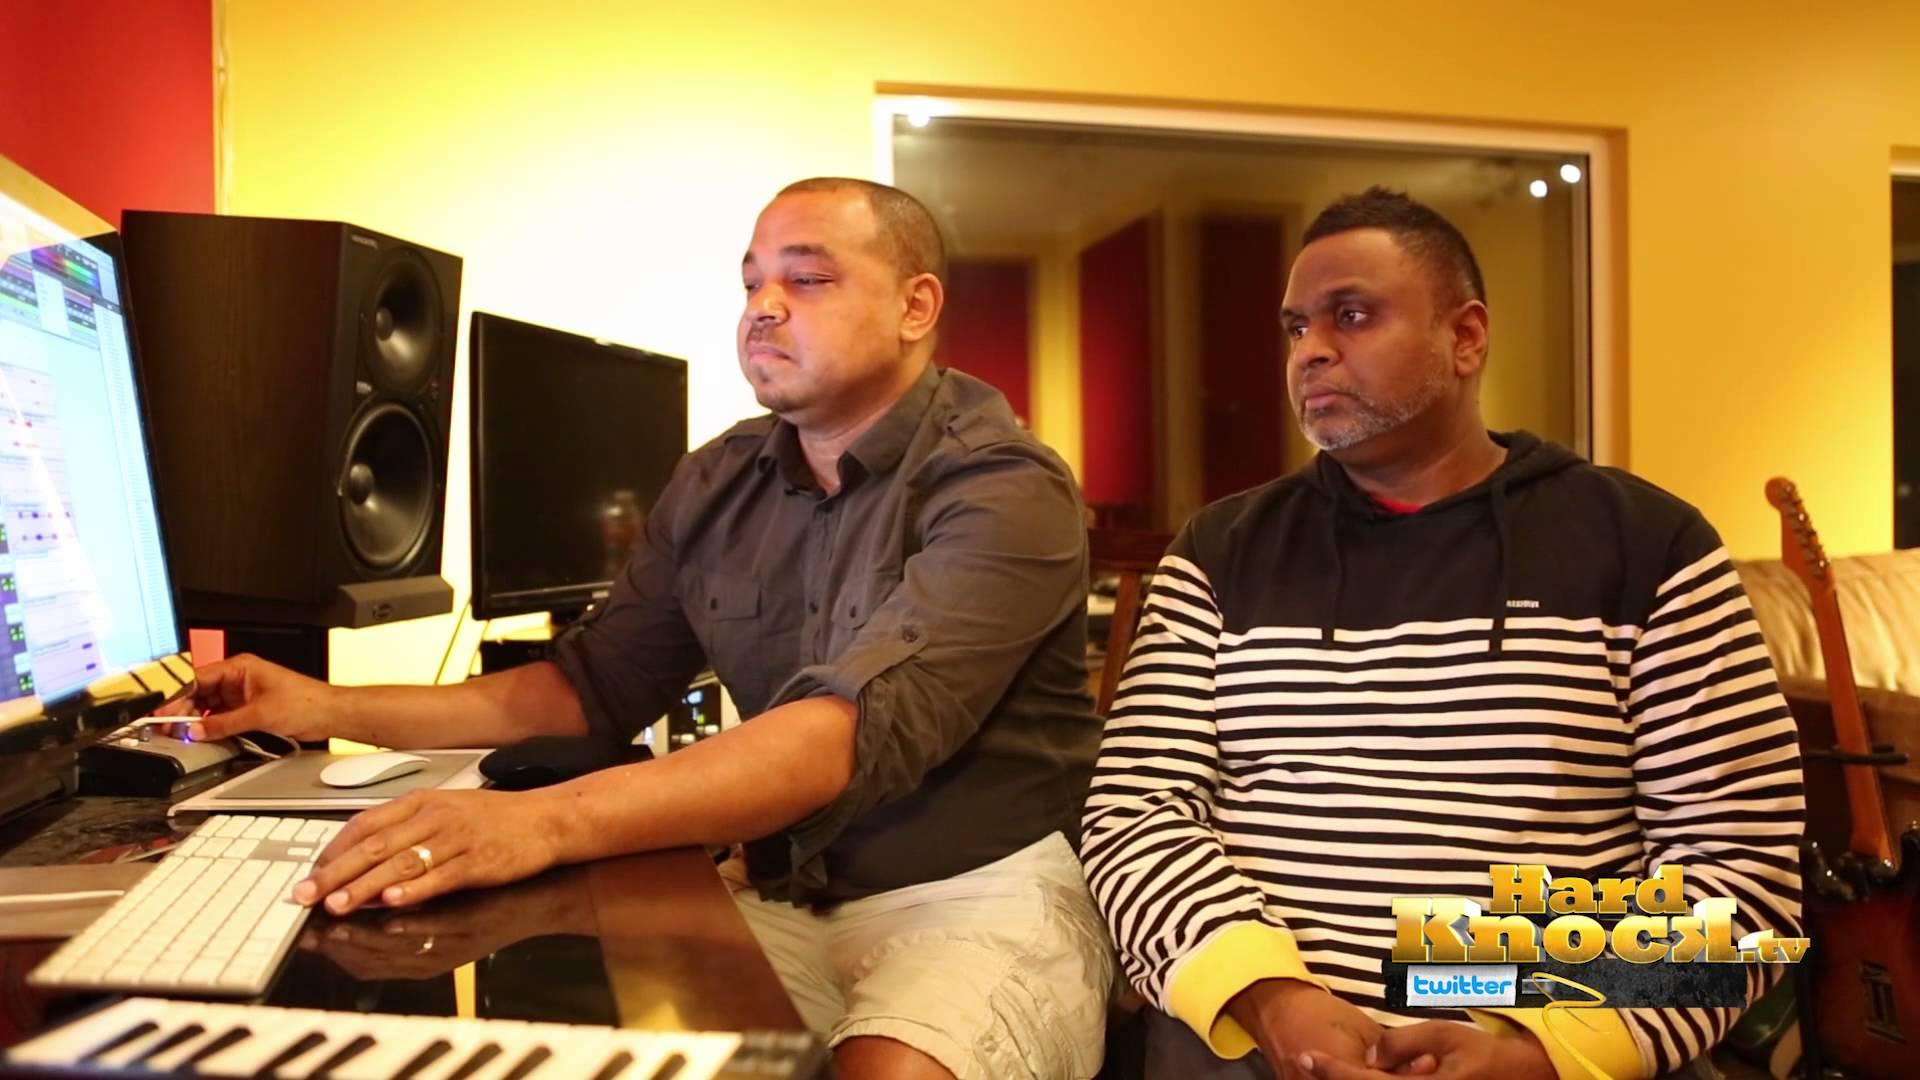 DJ Khalil Chin Injeti on How They Built Choir for Aloe Blacc The Man interview by Nick Huff Barili Hard knock tv